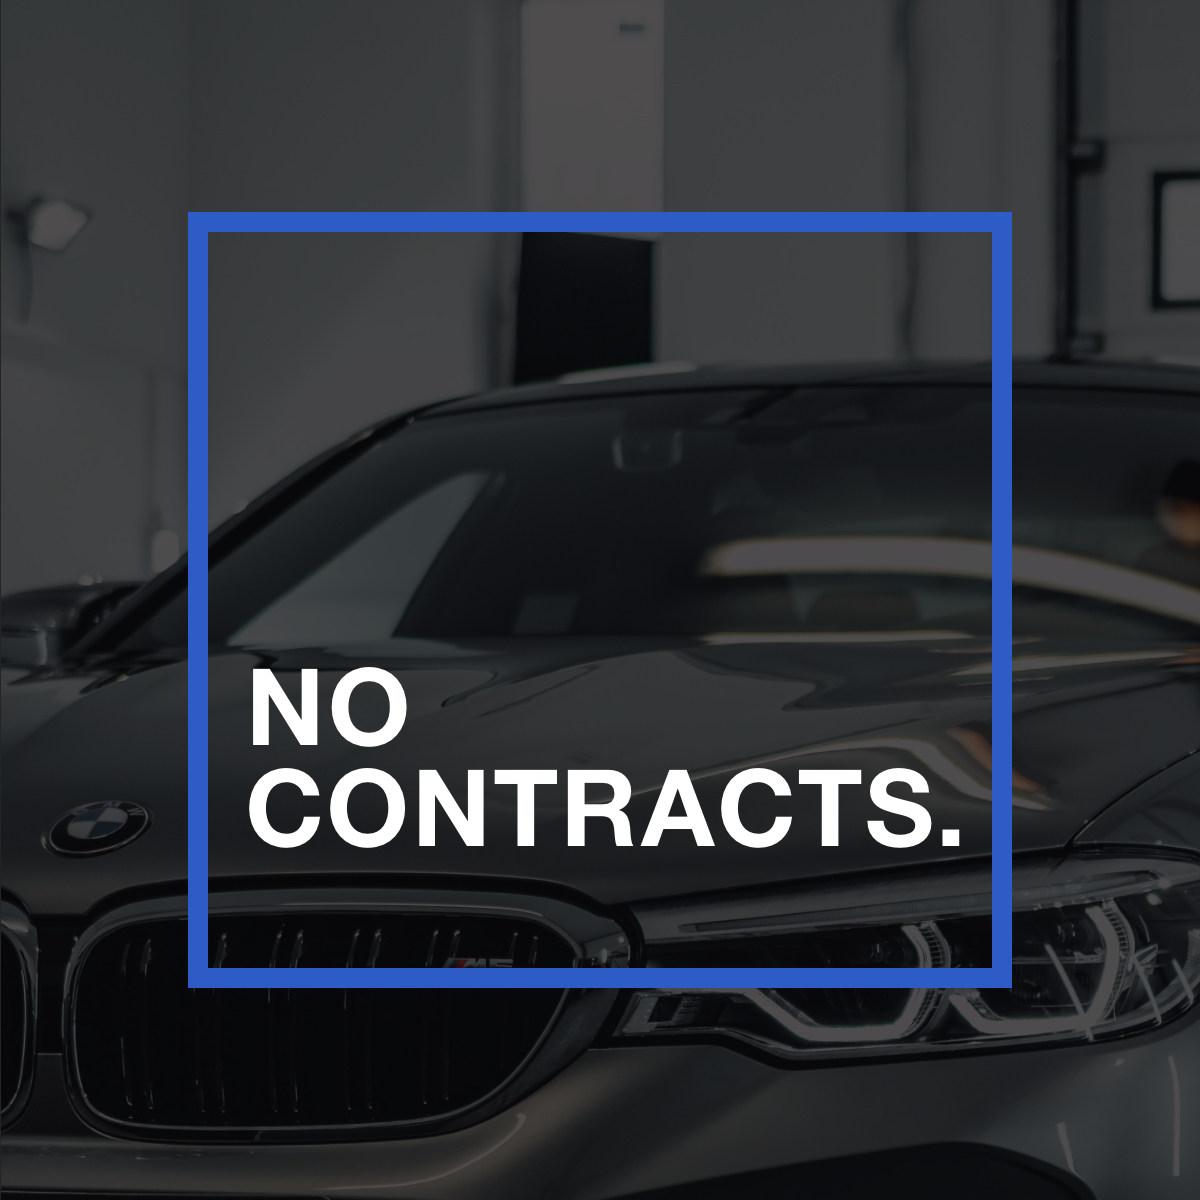 BMW-Google3.jpg